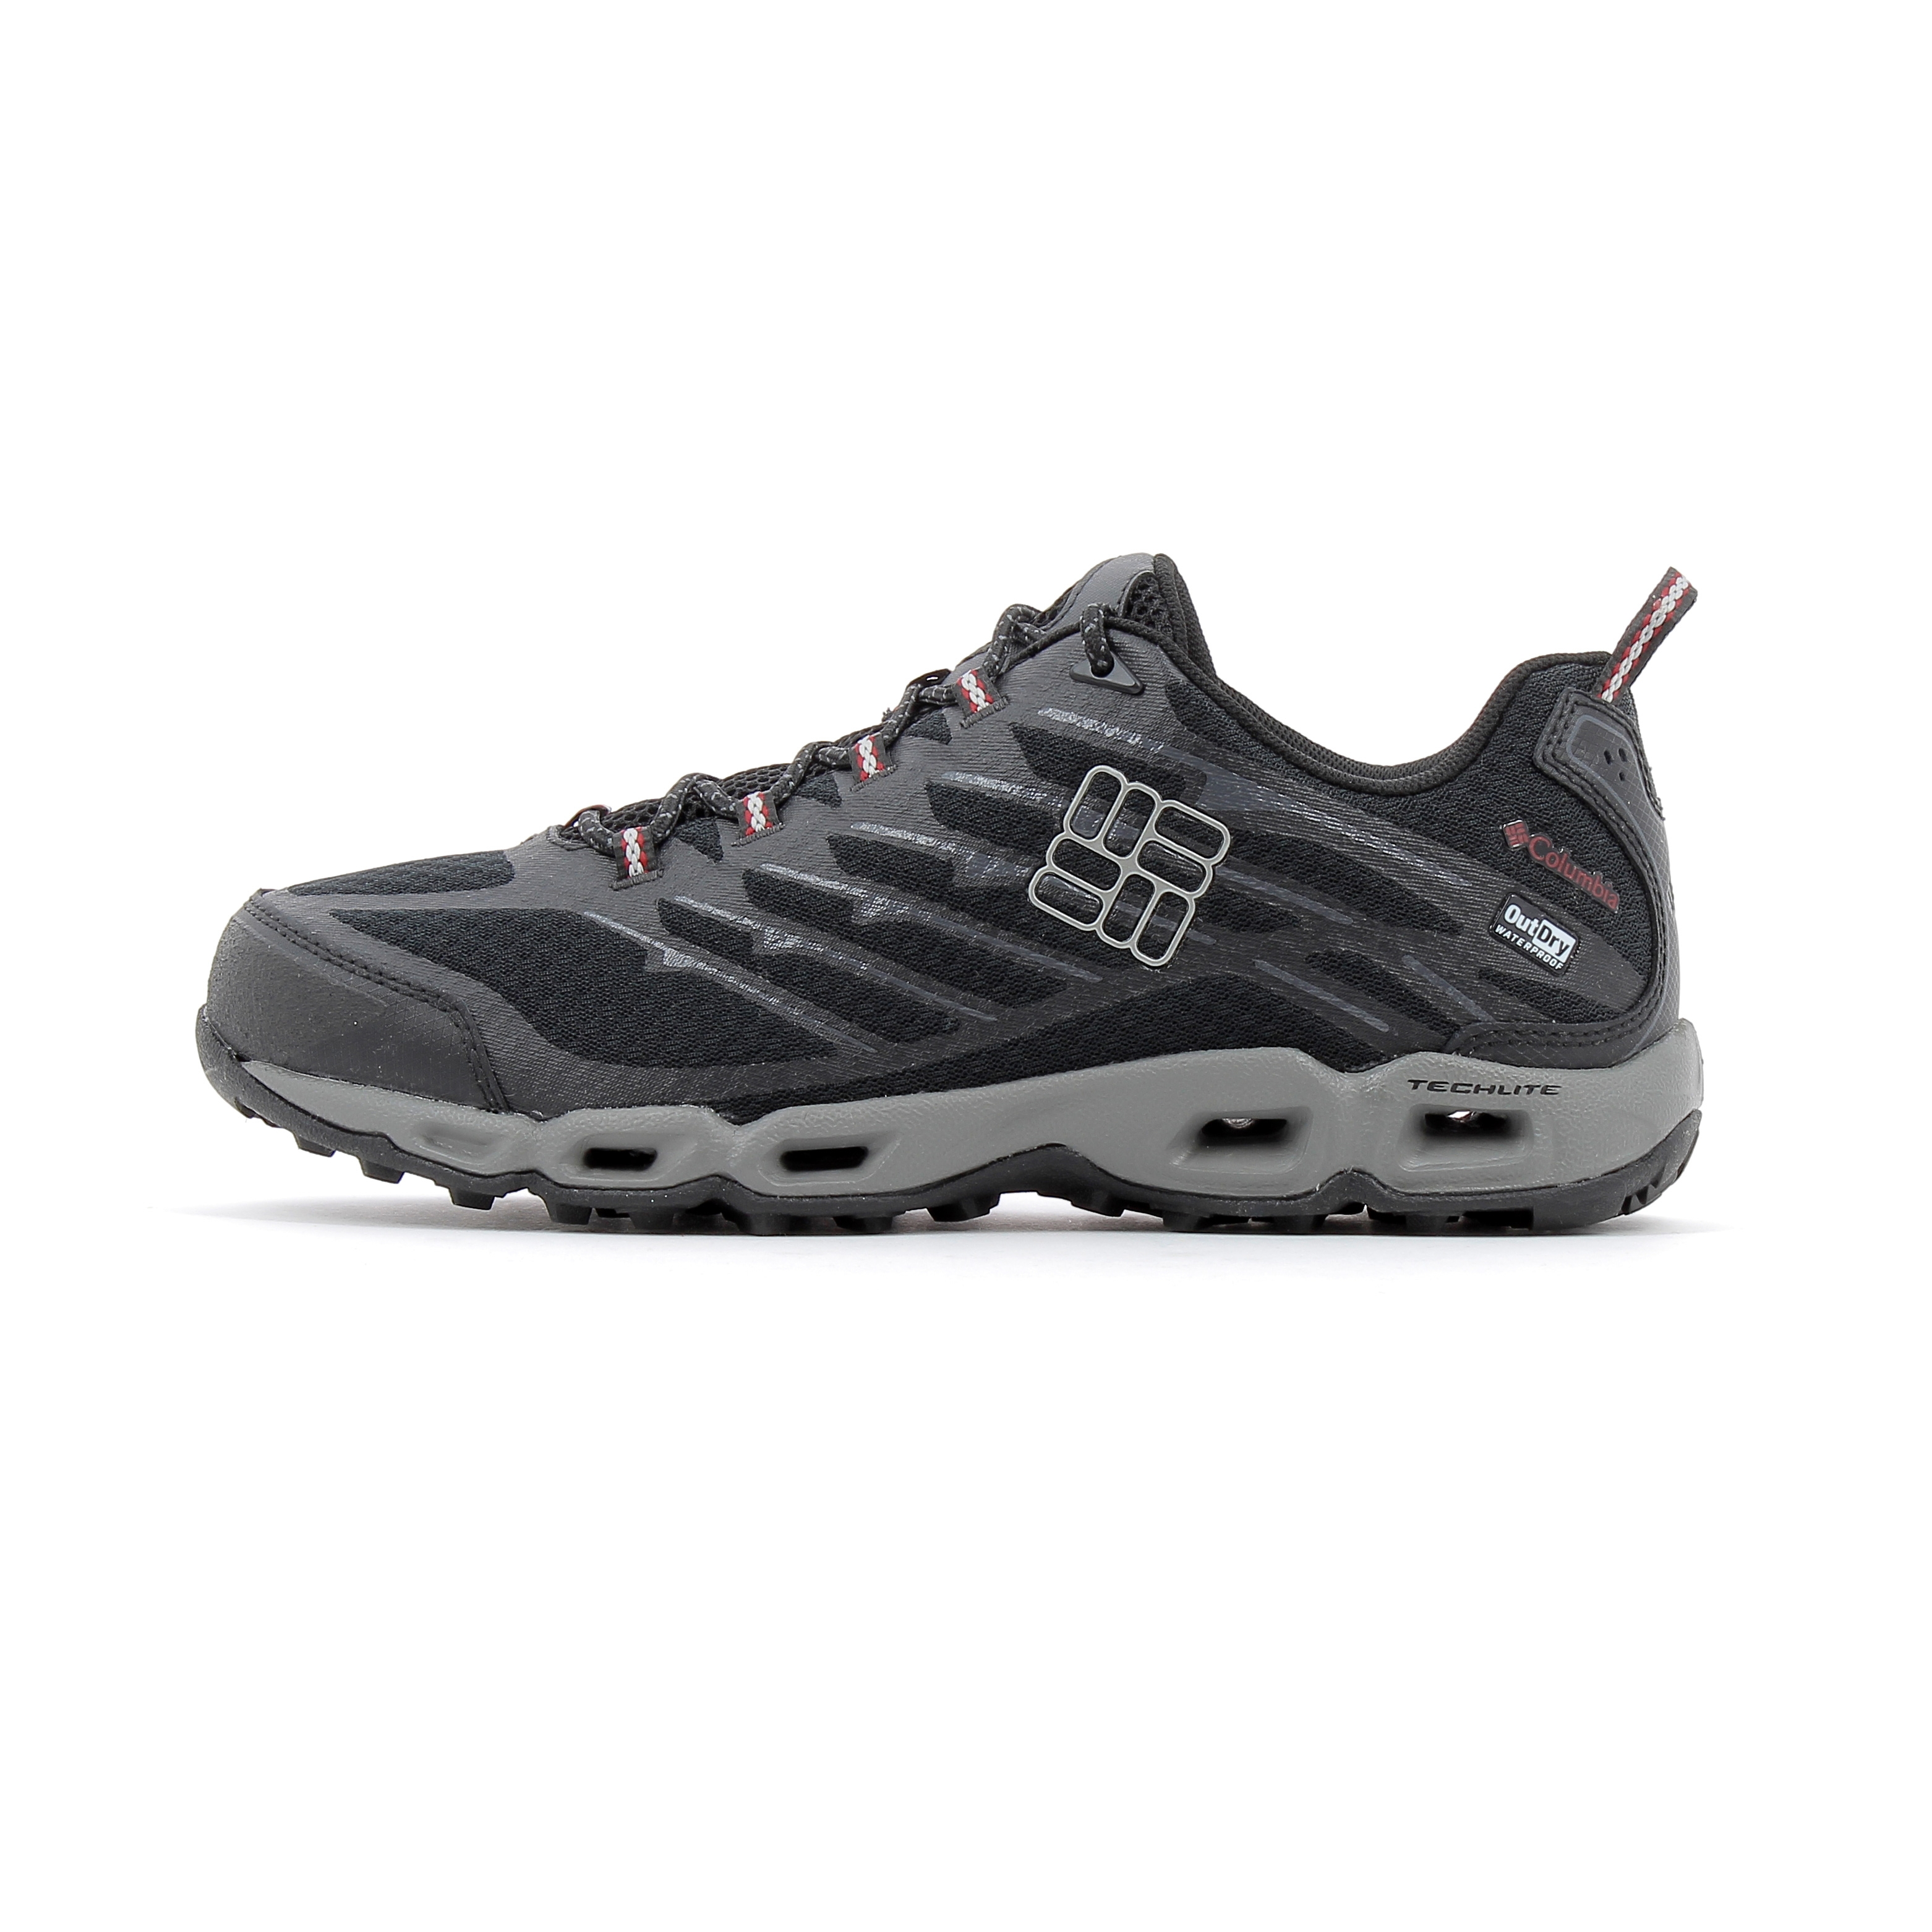 Outdry Columbia Ii De Ventrailia Chaussures Noir Trail 8aEpX